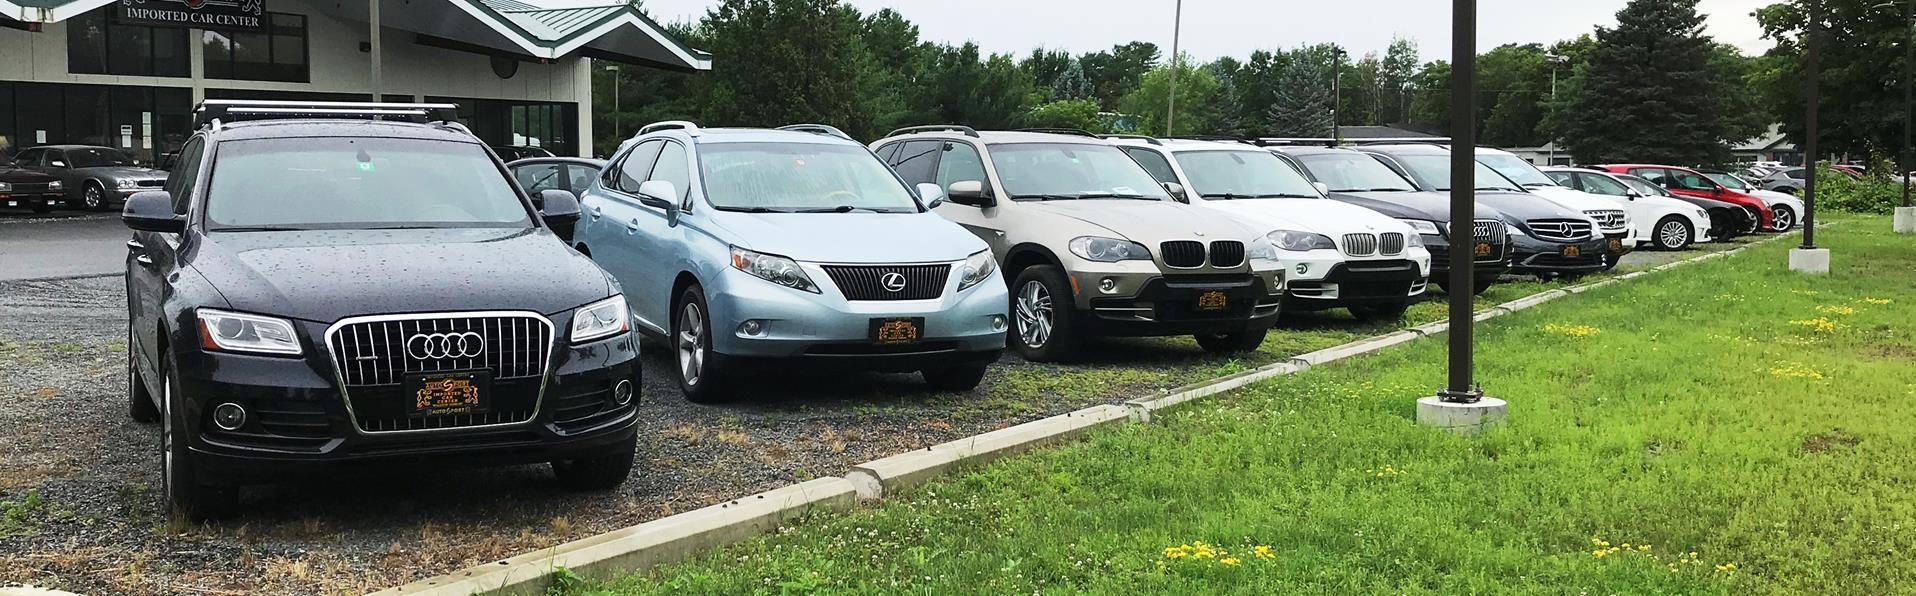 Used Cars Burlington Vt >> Used Cars South Burlington Vt Used Cars Trucks Vt